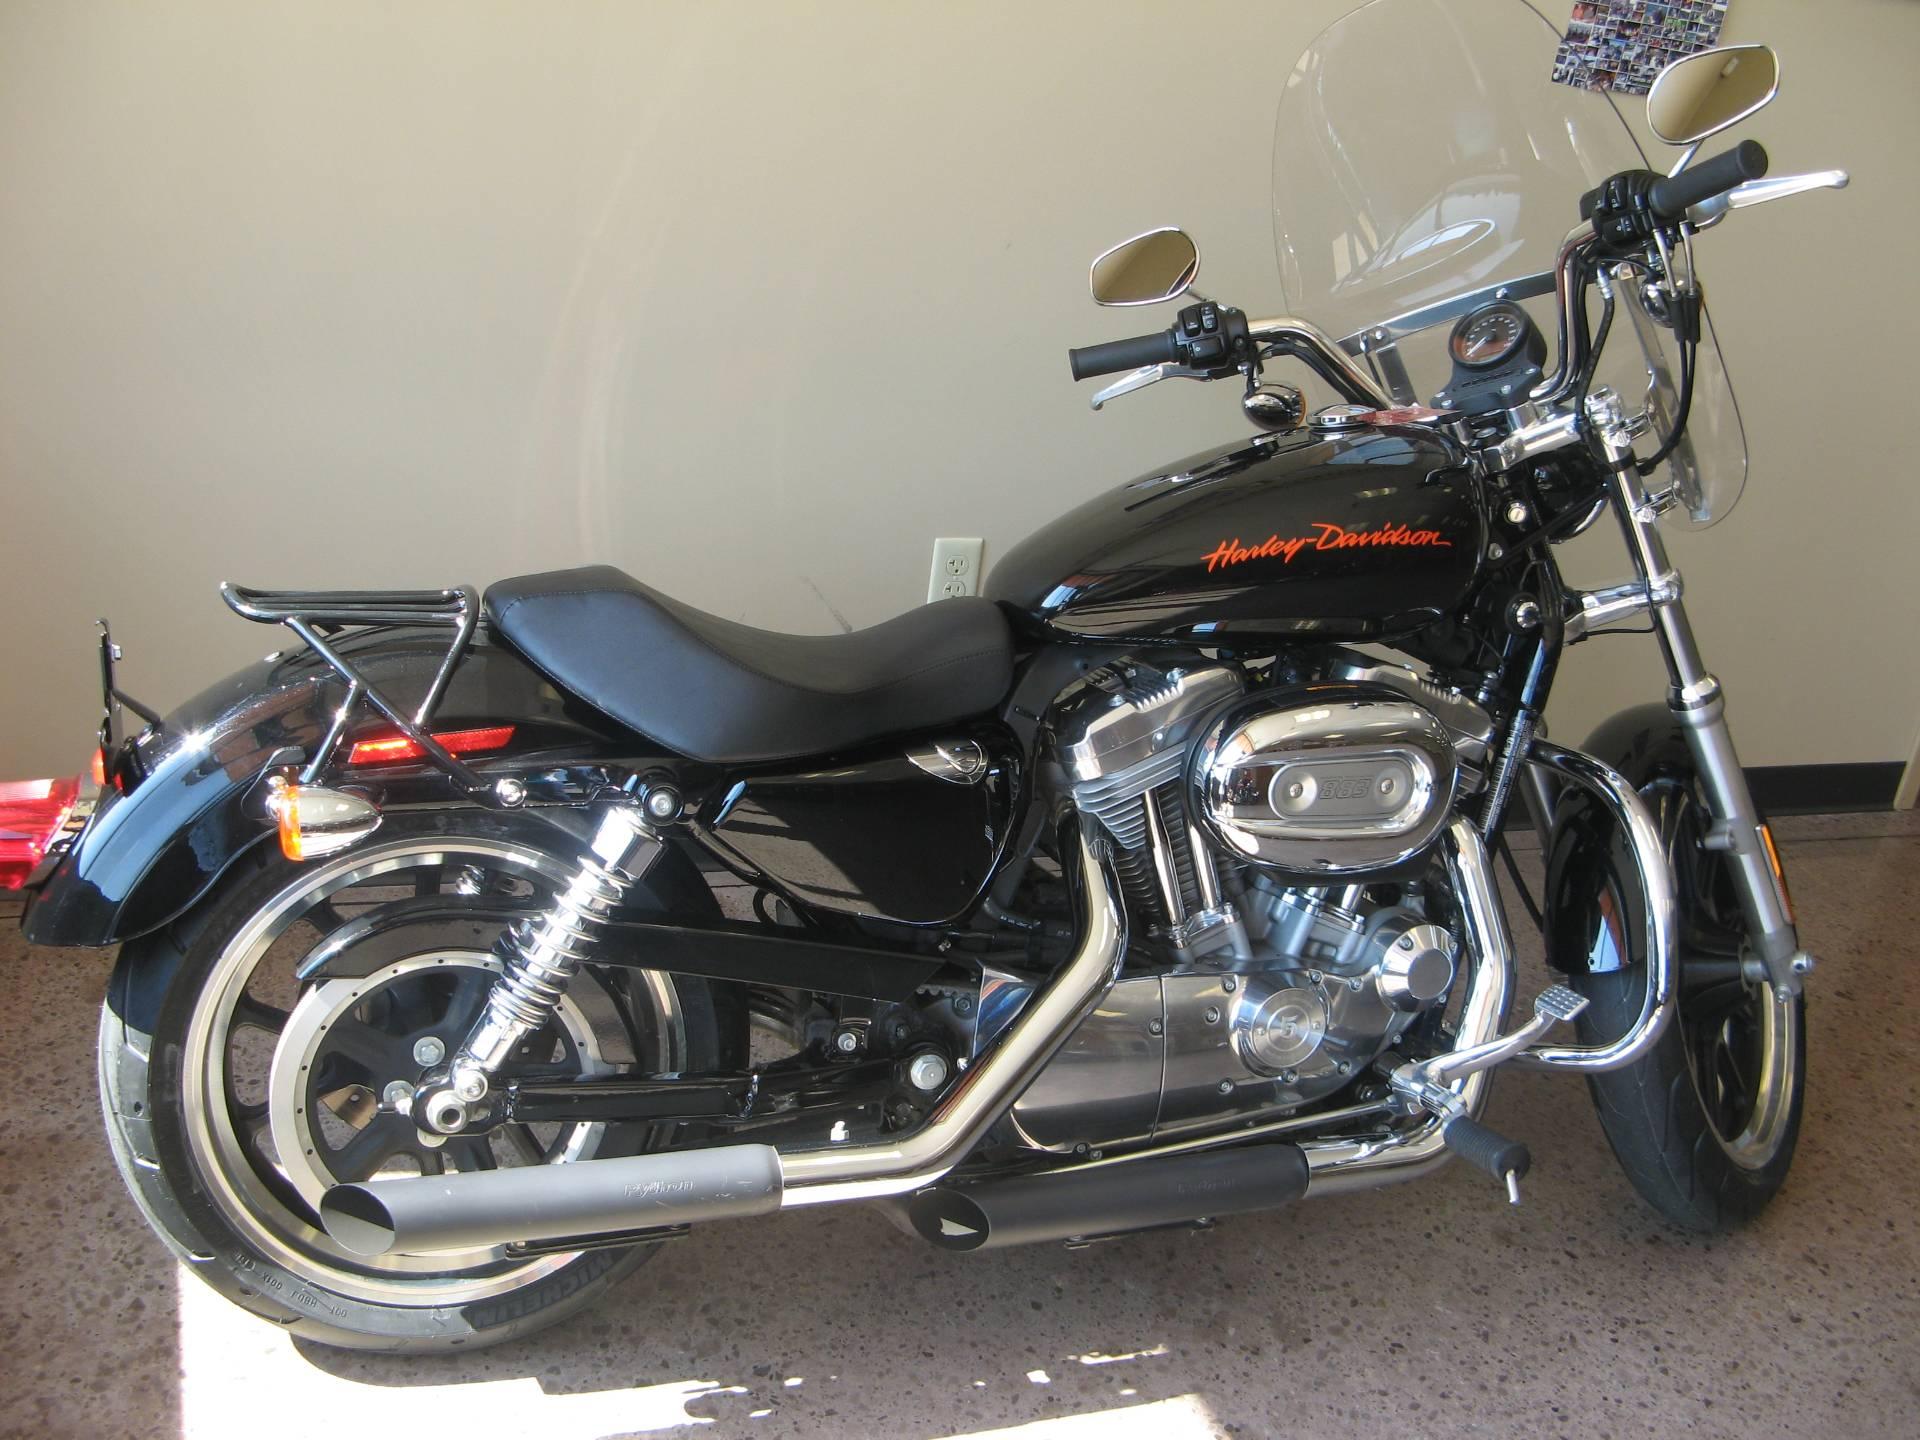 Used 2013 Harley-Davidson Sportster® 883 SuperLow® Motorcycles in ...